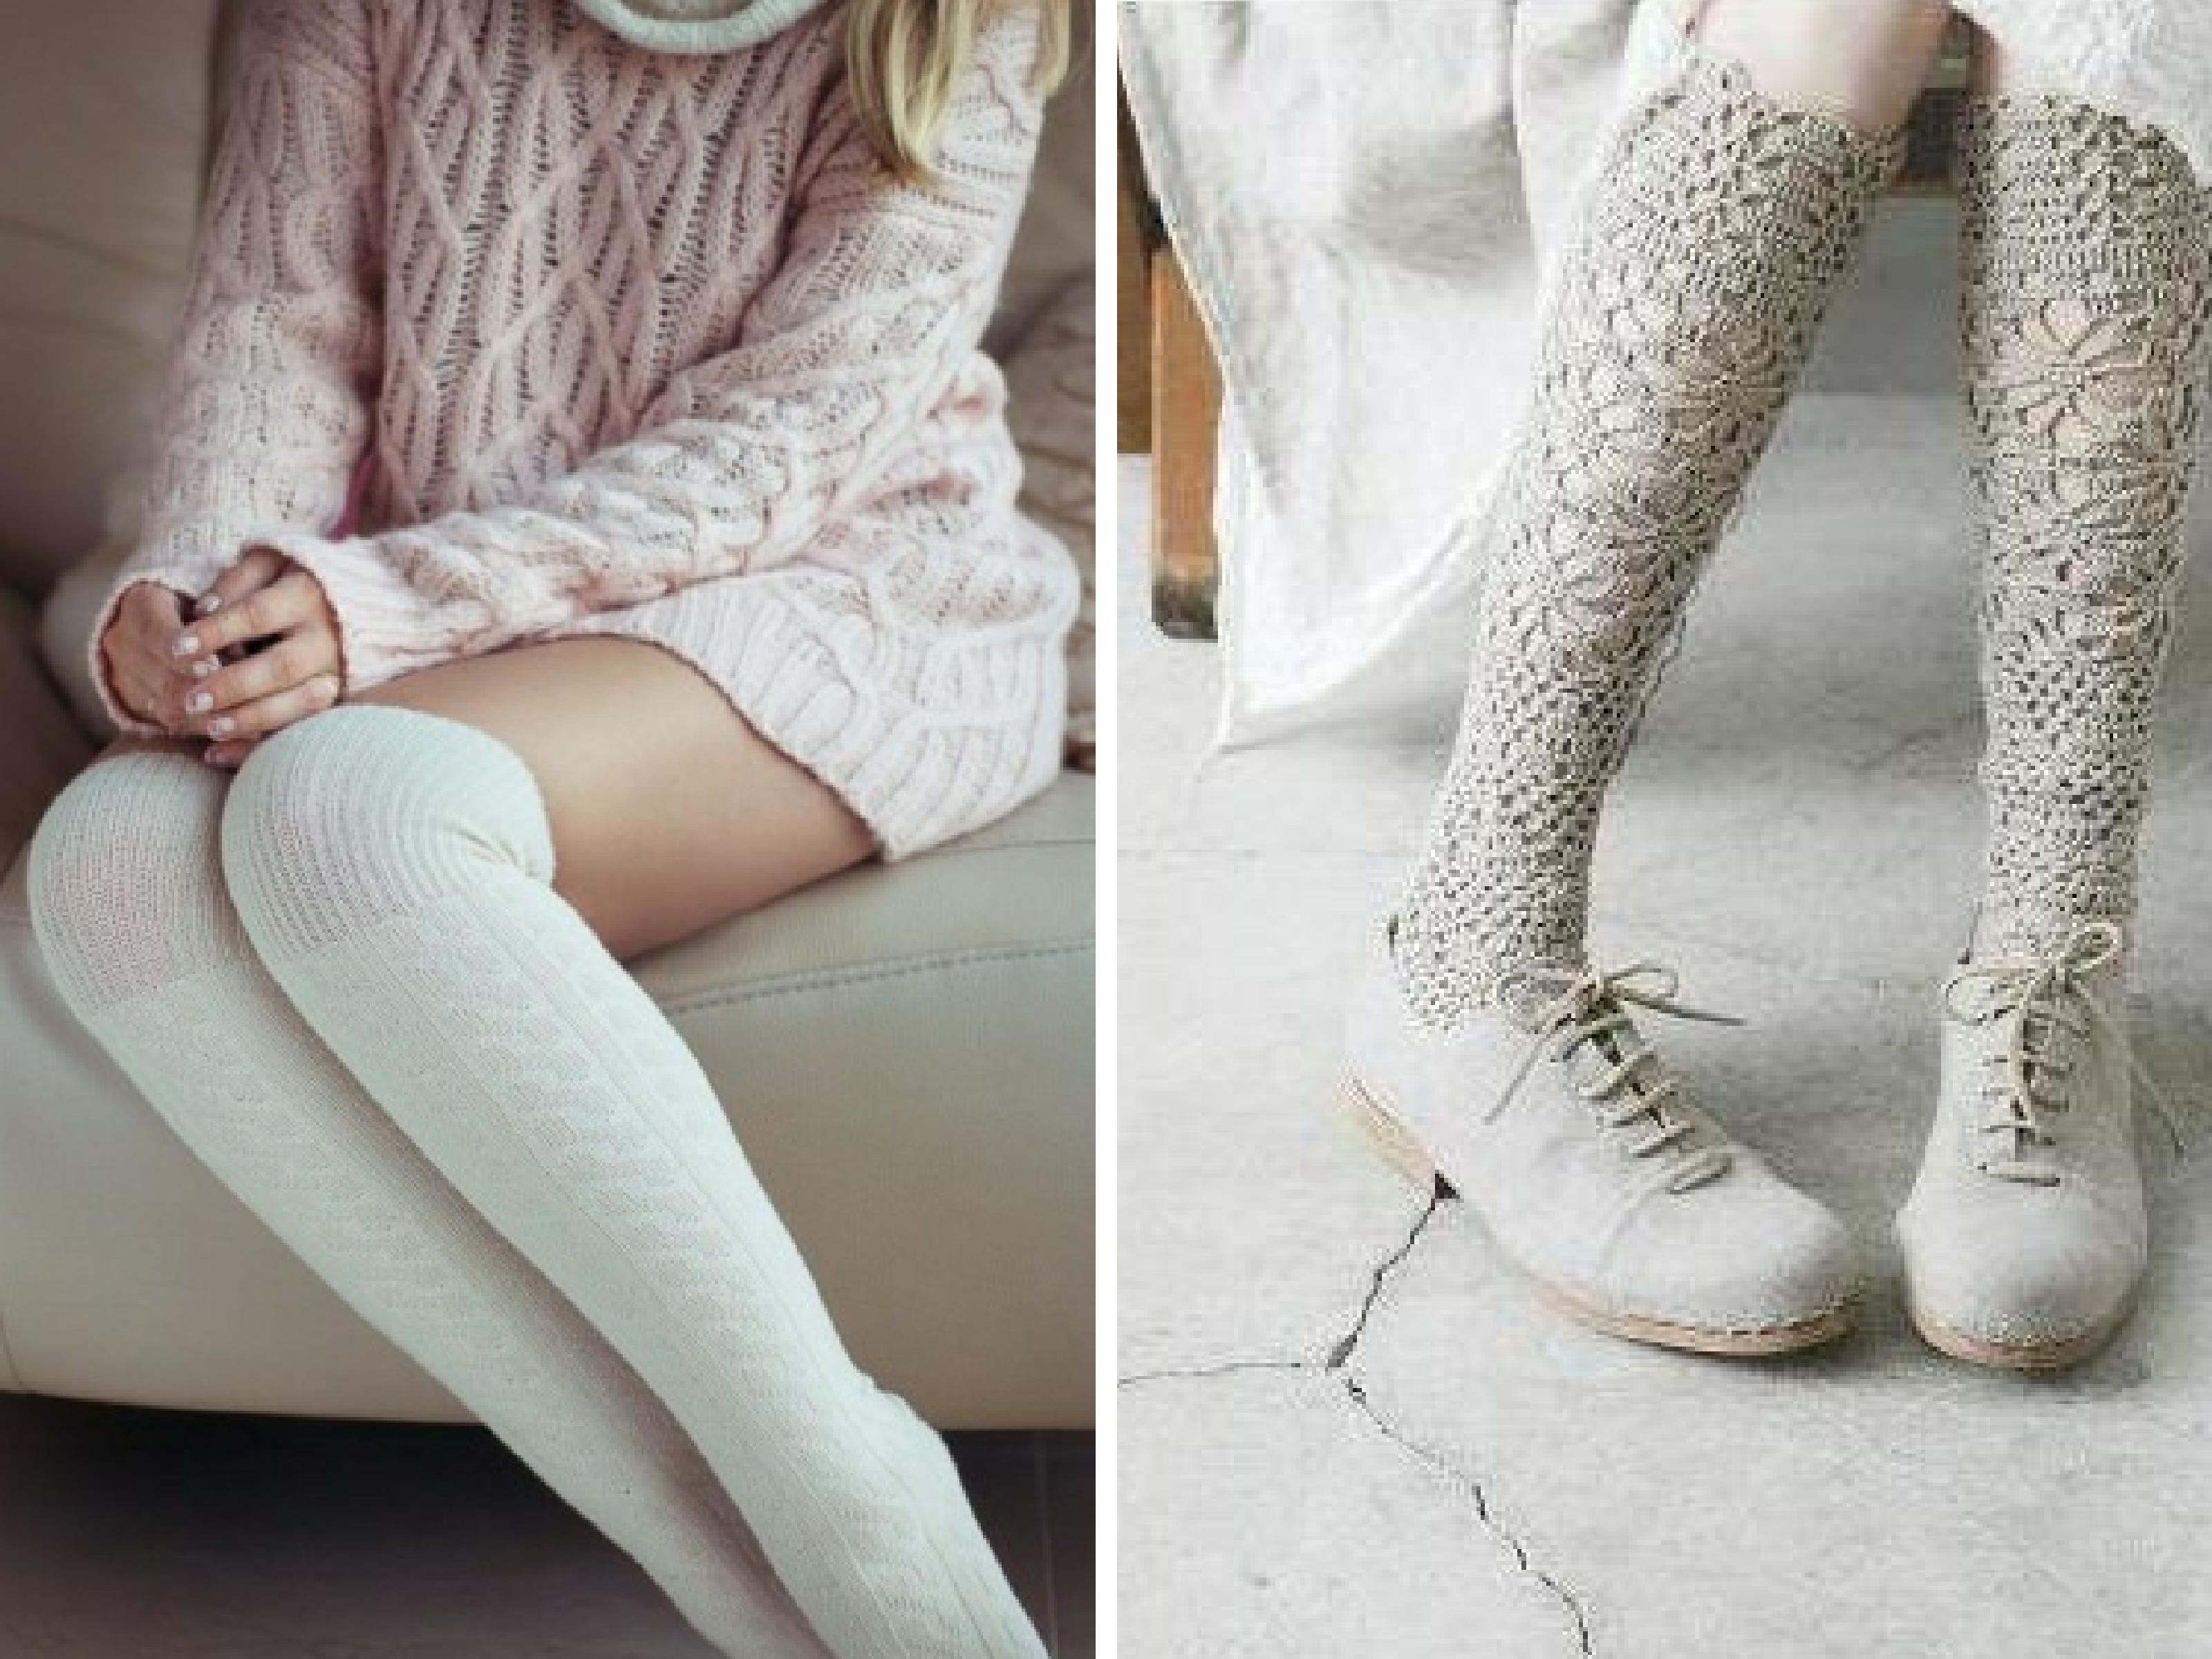 женские теплые чулки блог о нижнем белье Anamelcomua